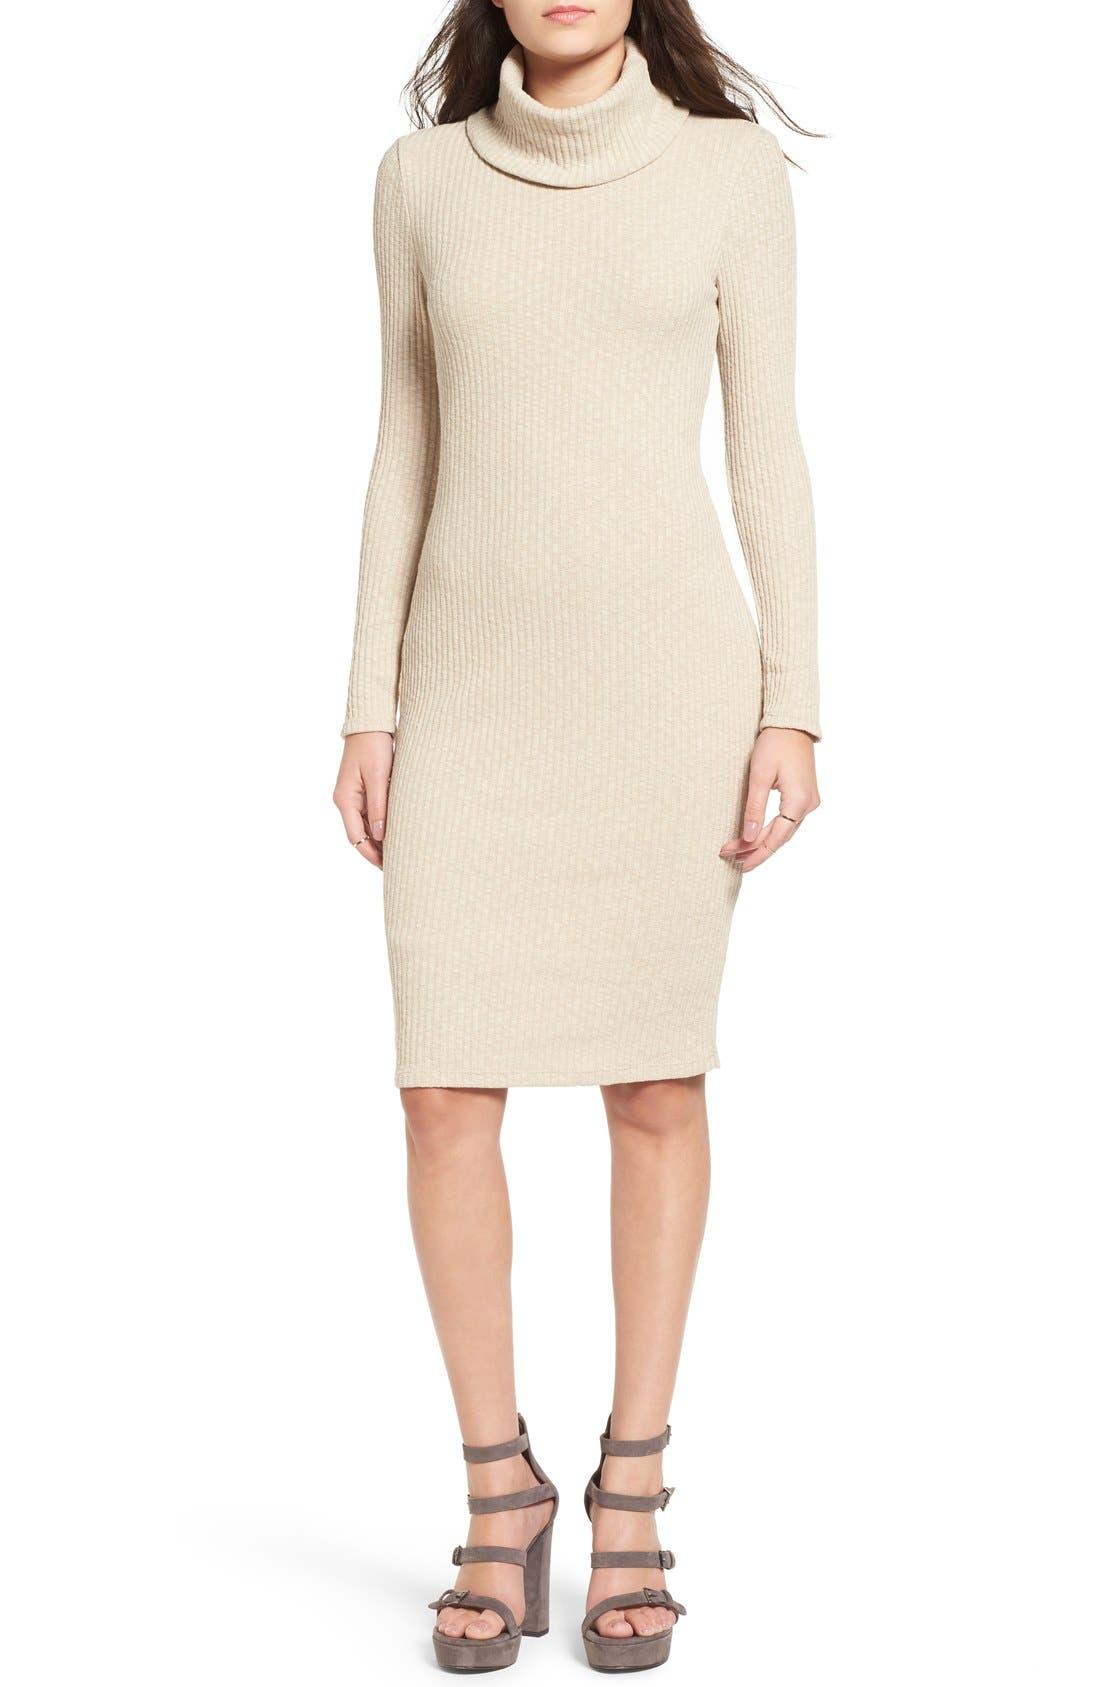 Alternate Image 1 Selected - Lush Turtleneck Body-Con Sweater Dress